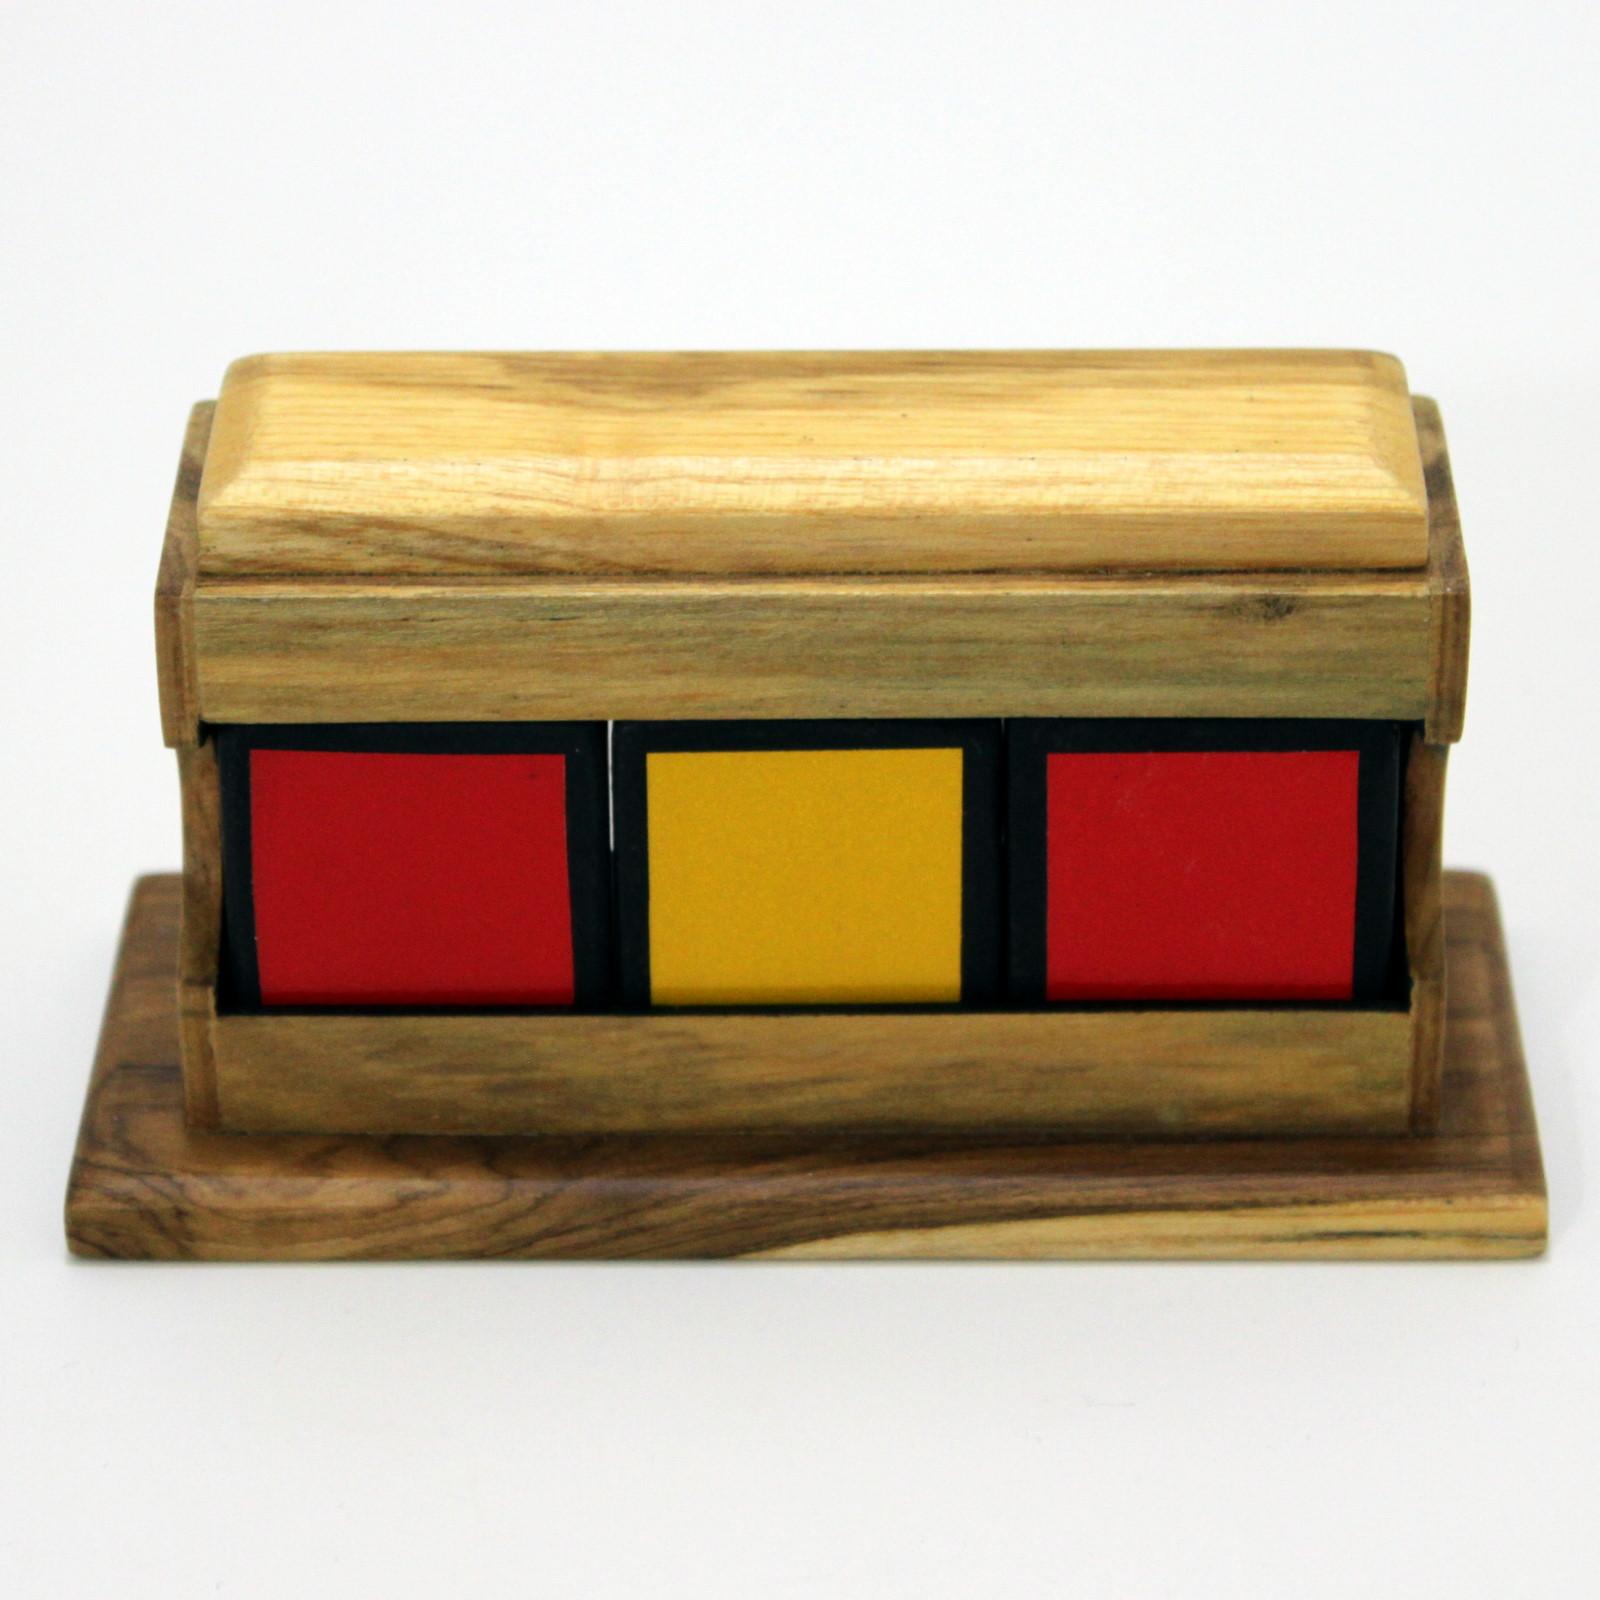 Squeeze Away Block (Mini) by Vincenzo Di Fatta